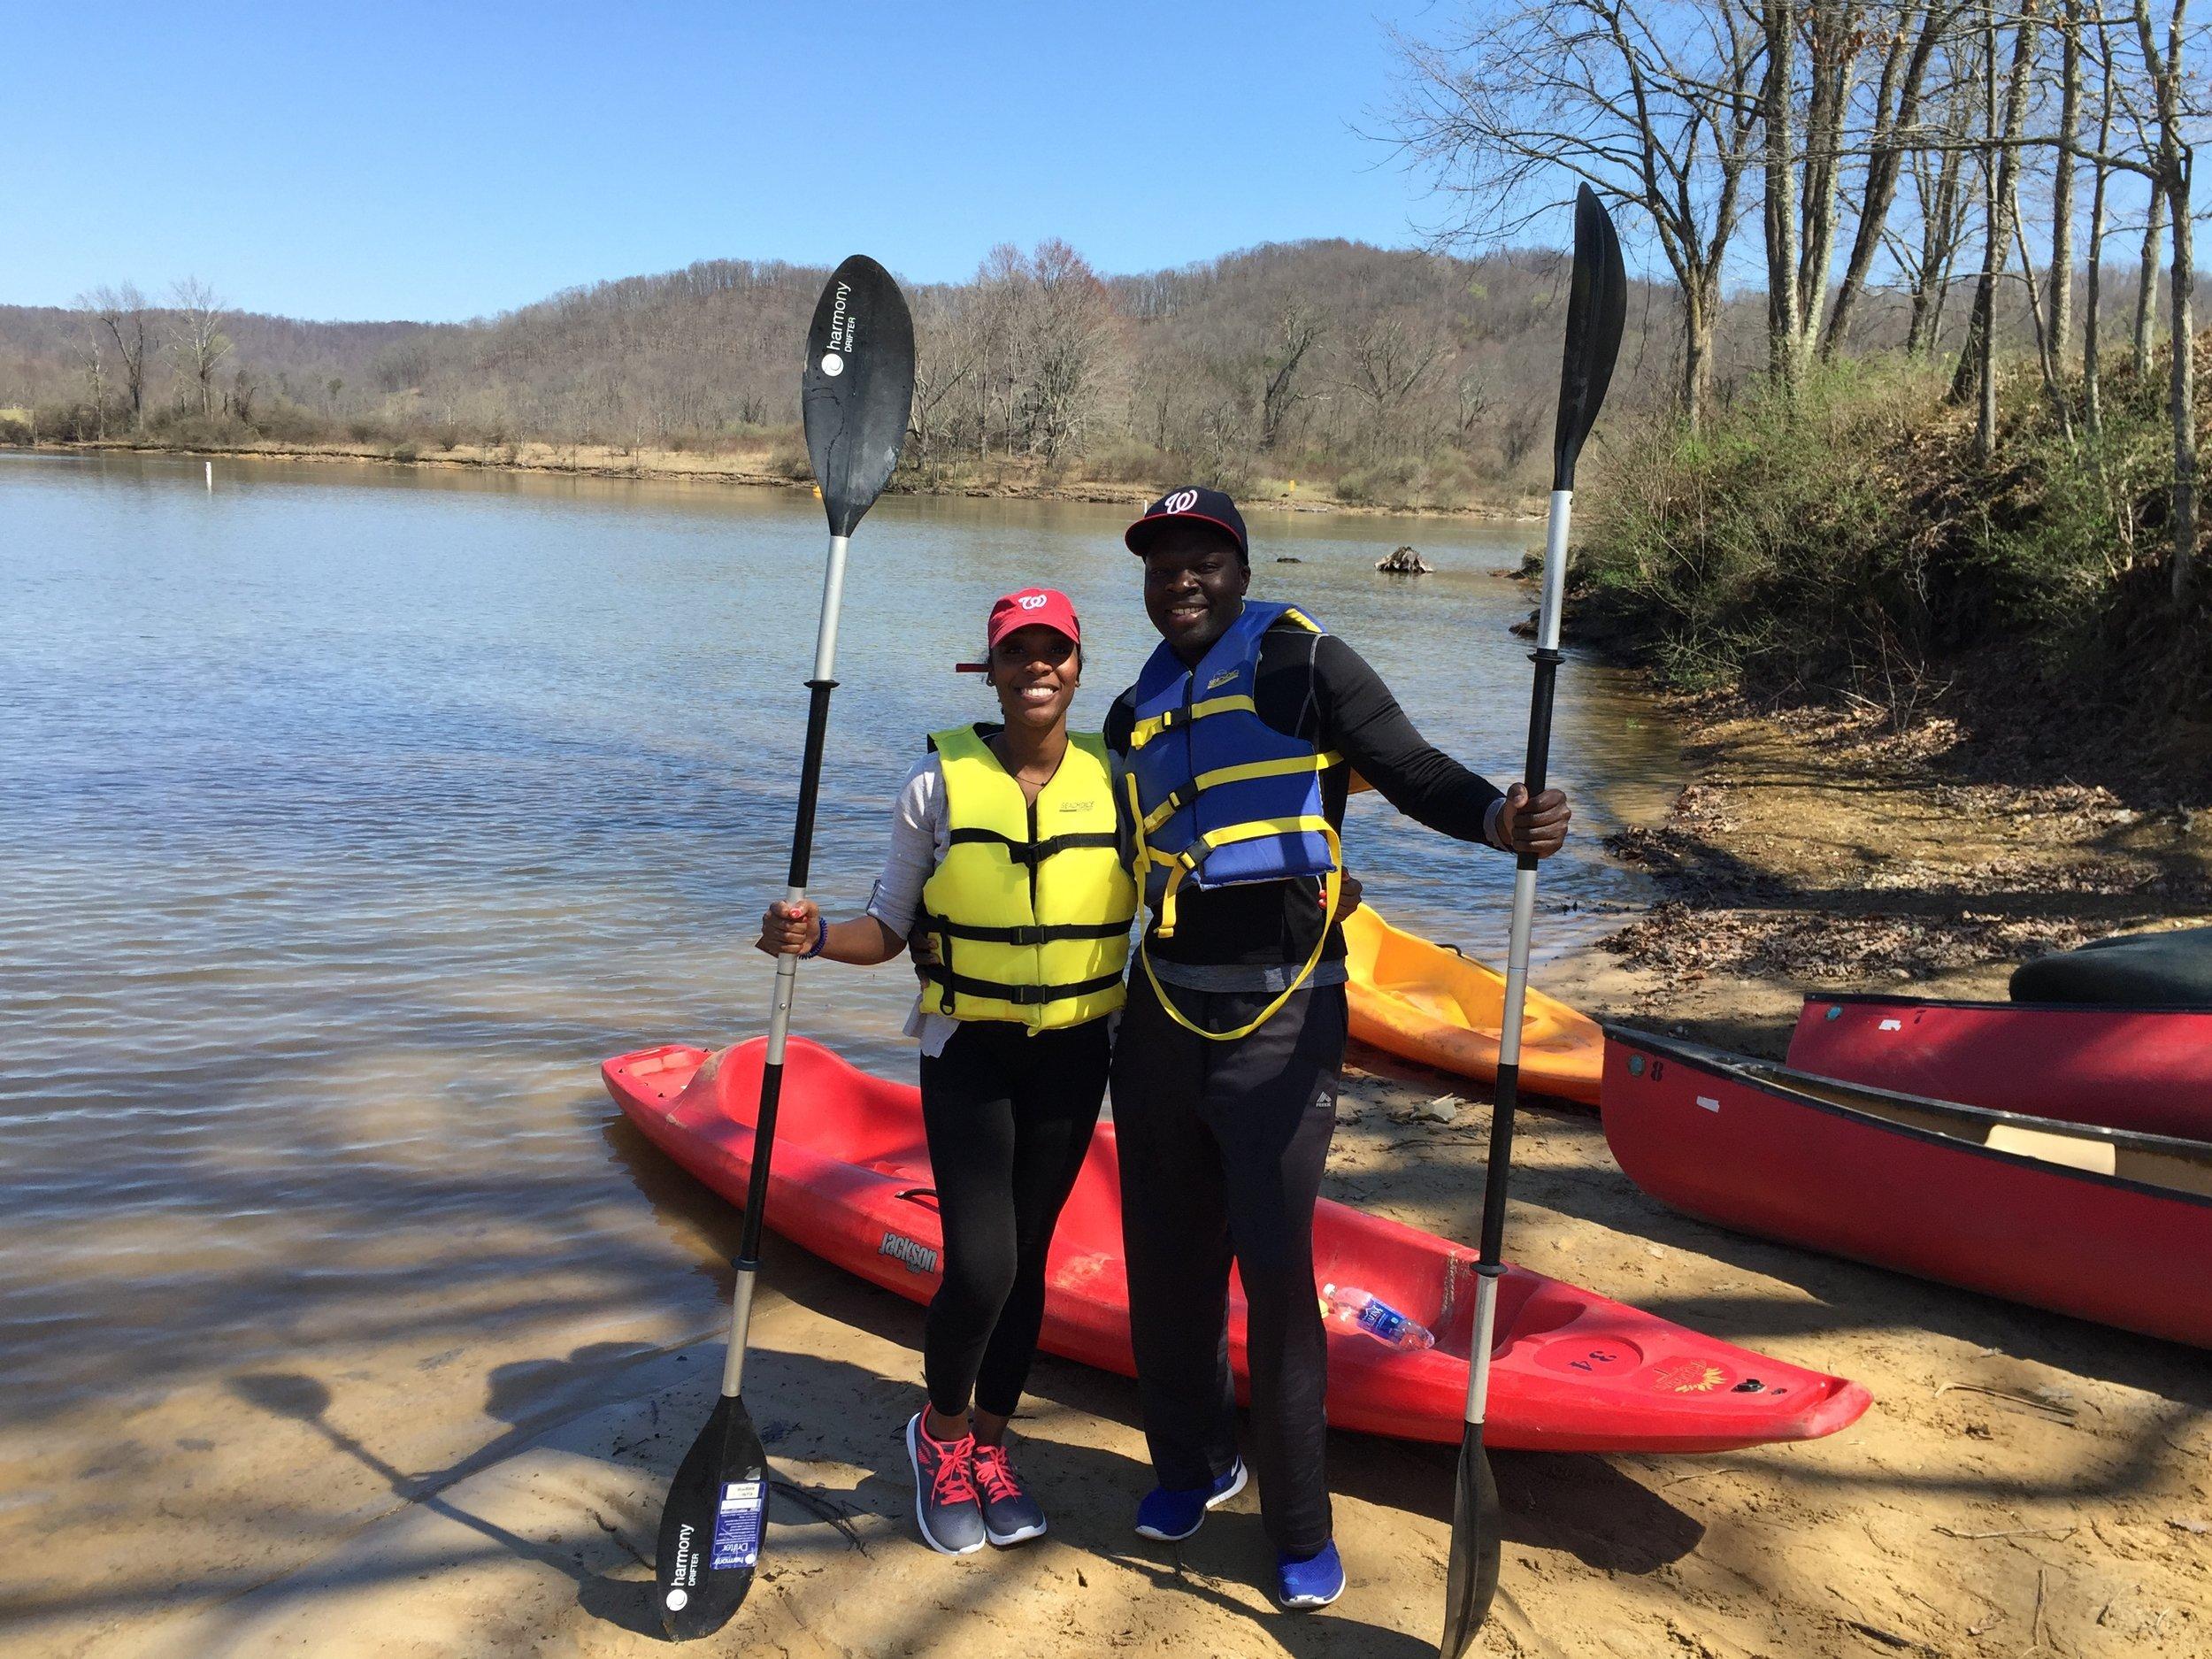 Getting ready to Kayak in West Virginia. Celebrating Tolu's 33rd birthday.